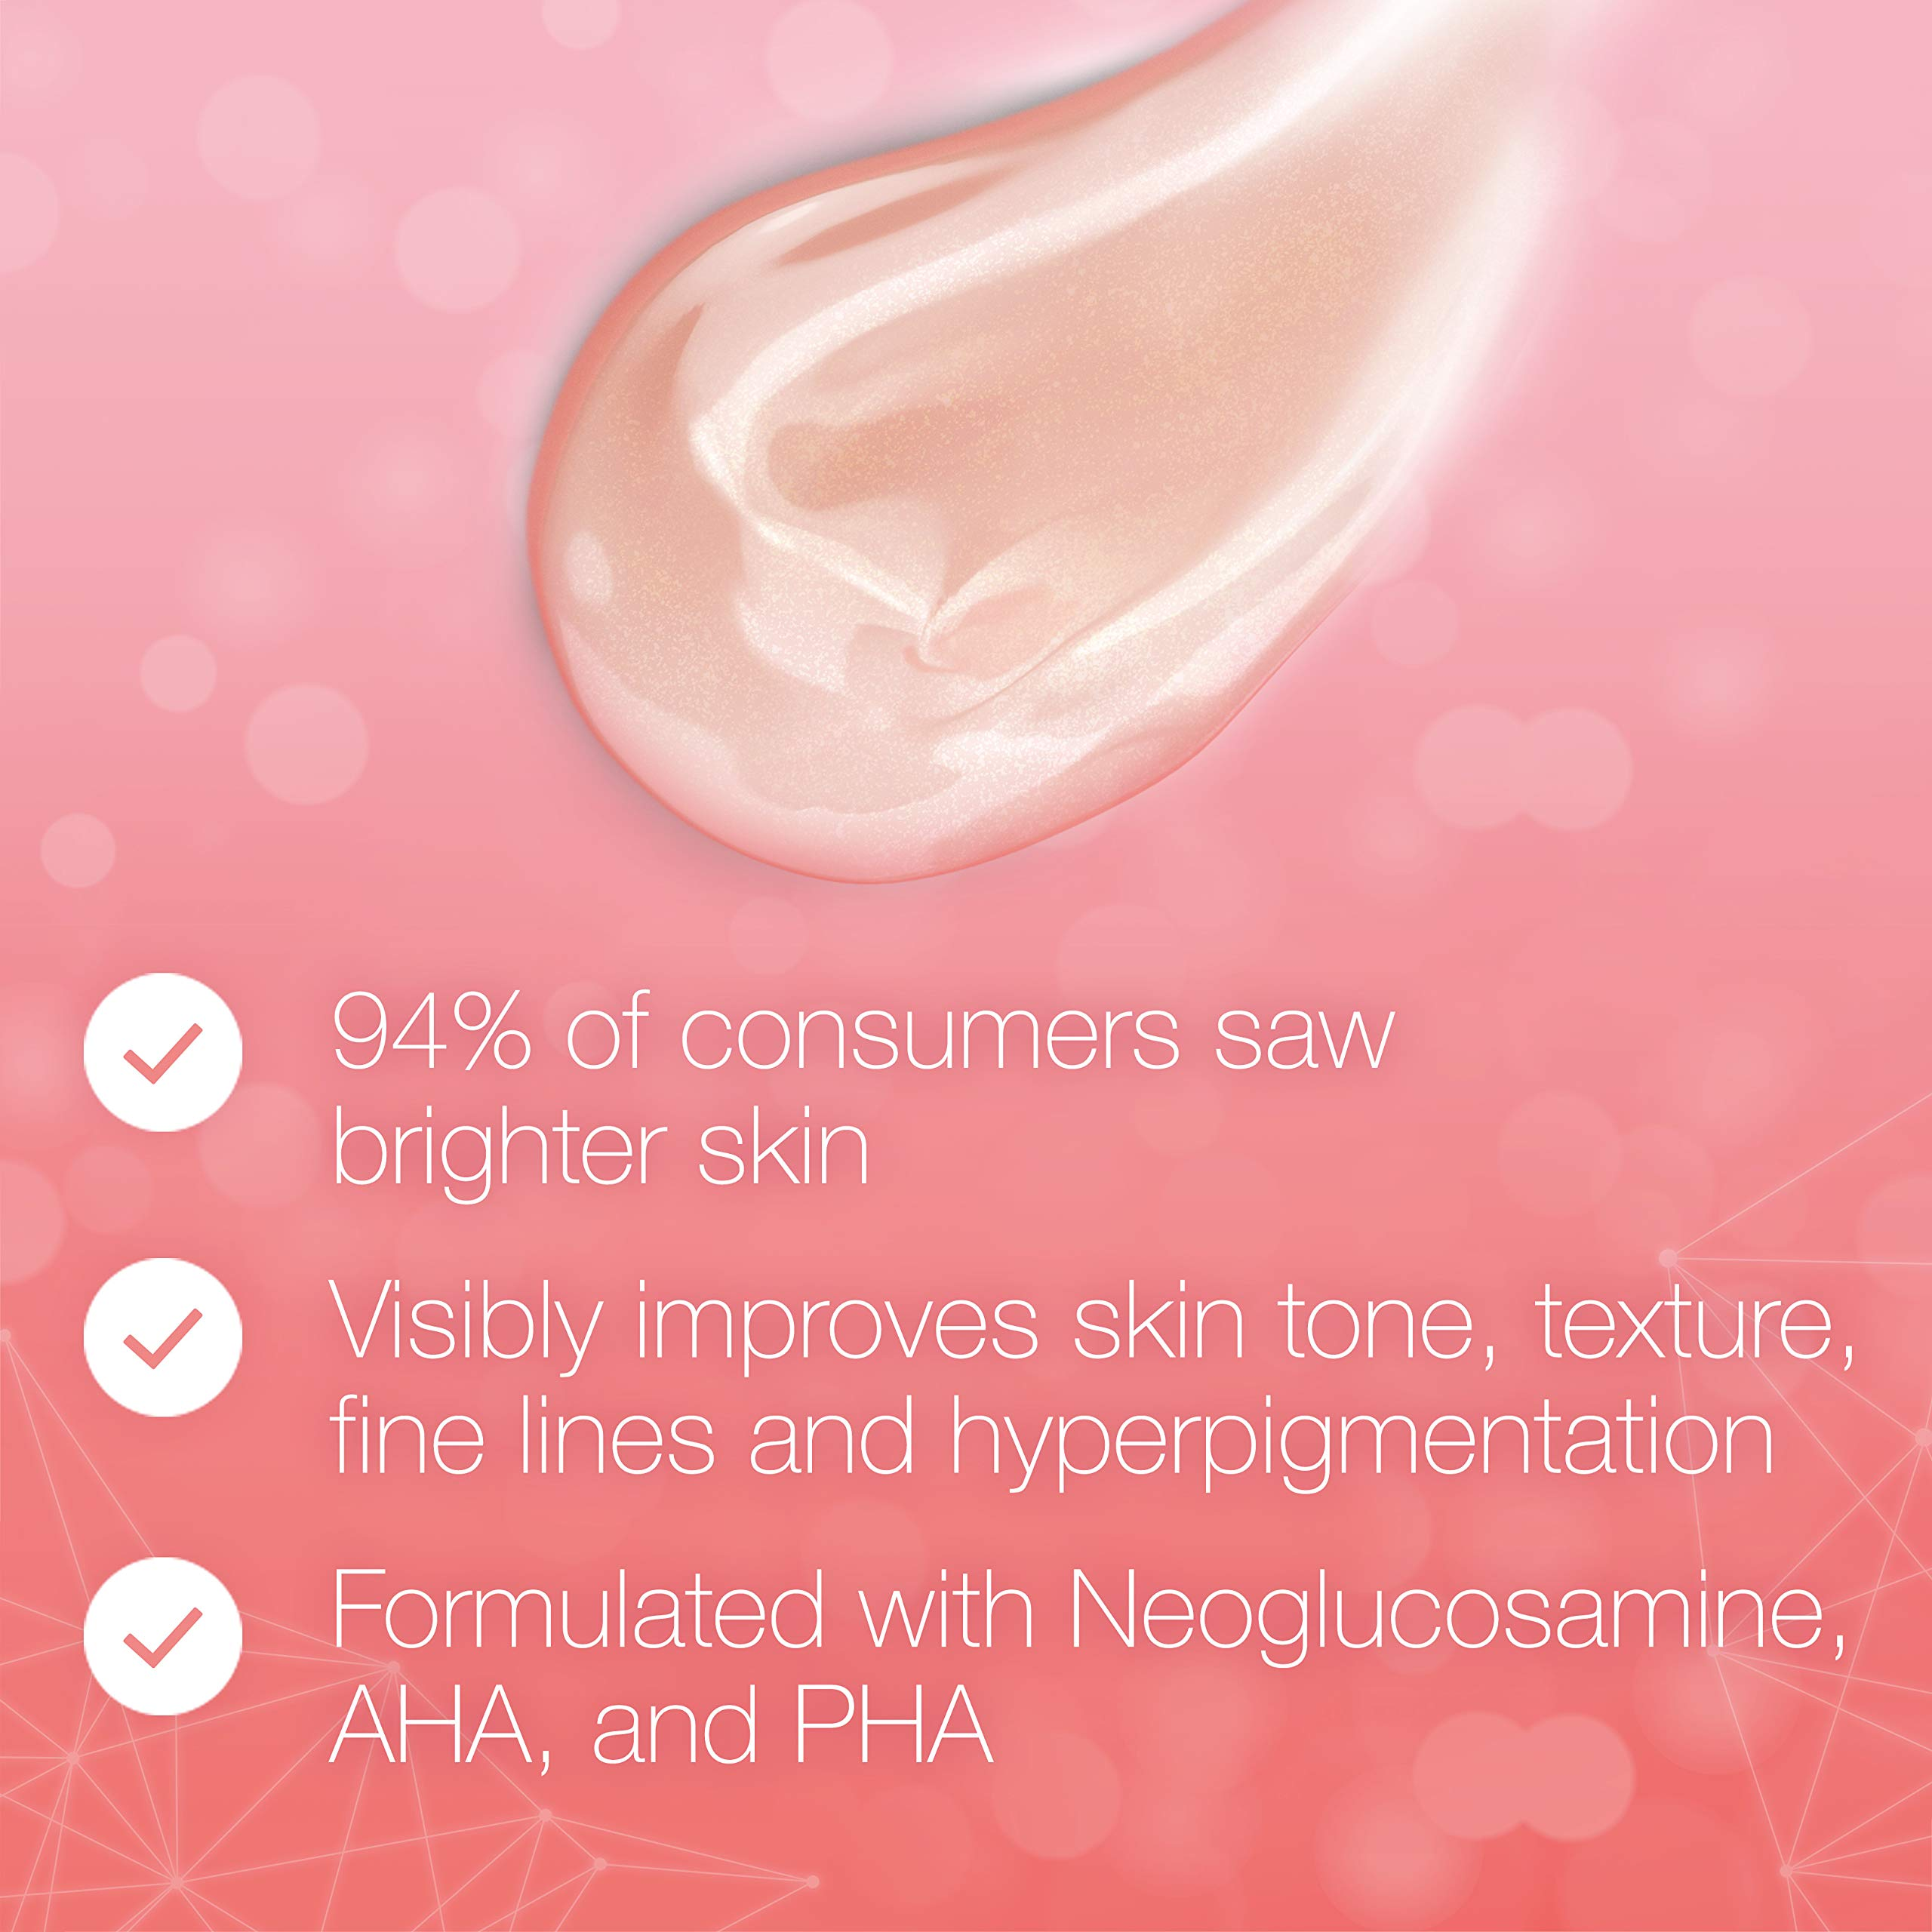 Neutrogena Bright Boost Brightening Gel Moisturizing Face Cream with Skin  Resurfacing and Brightening Neoglucosamine for smooth skin, Facial Cream  with AHA, PHA, and Mandelic Acids, 1.7 fl. oz giá tốt nhất 2020  